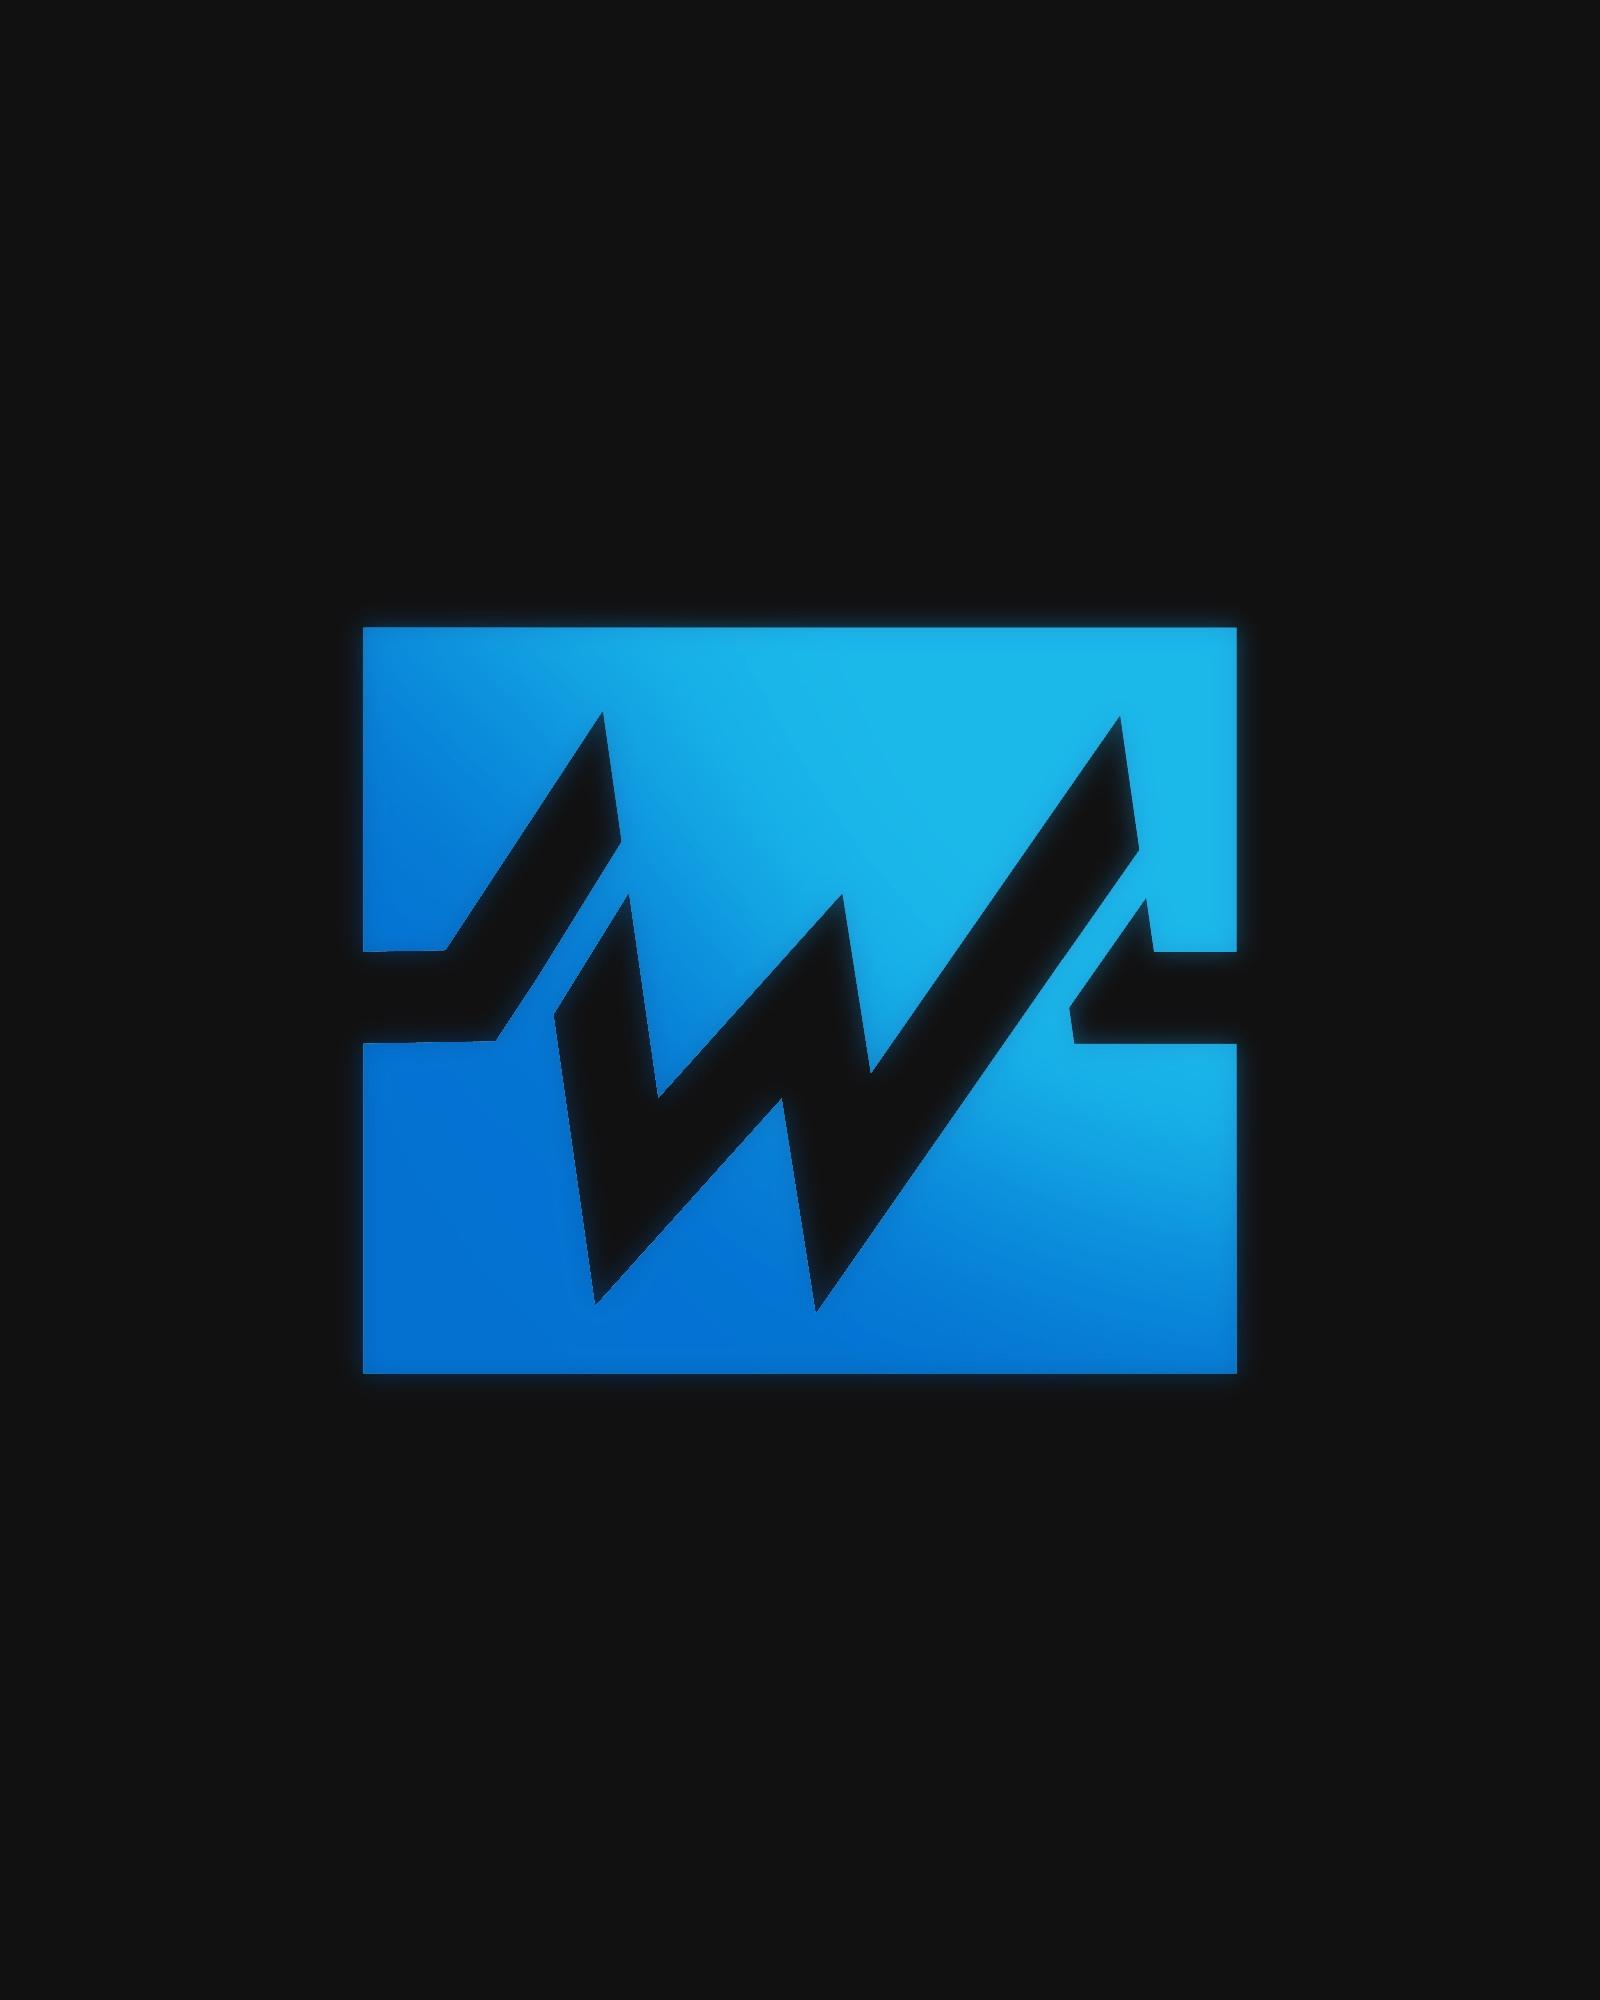 Logo Design - Icons, Emblems, Badges etc.